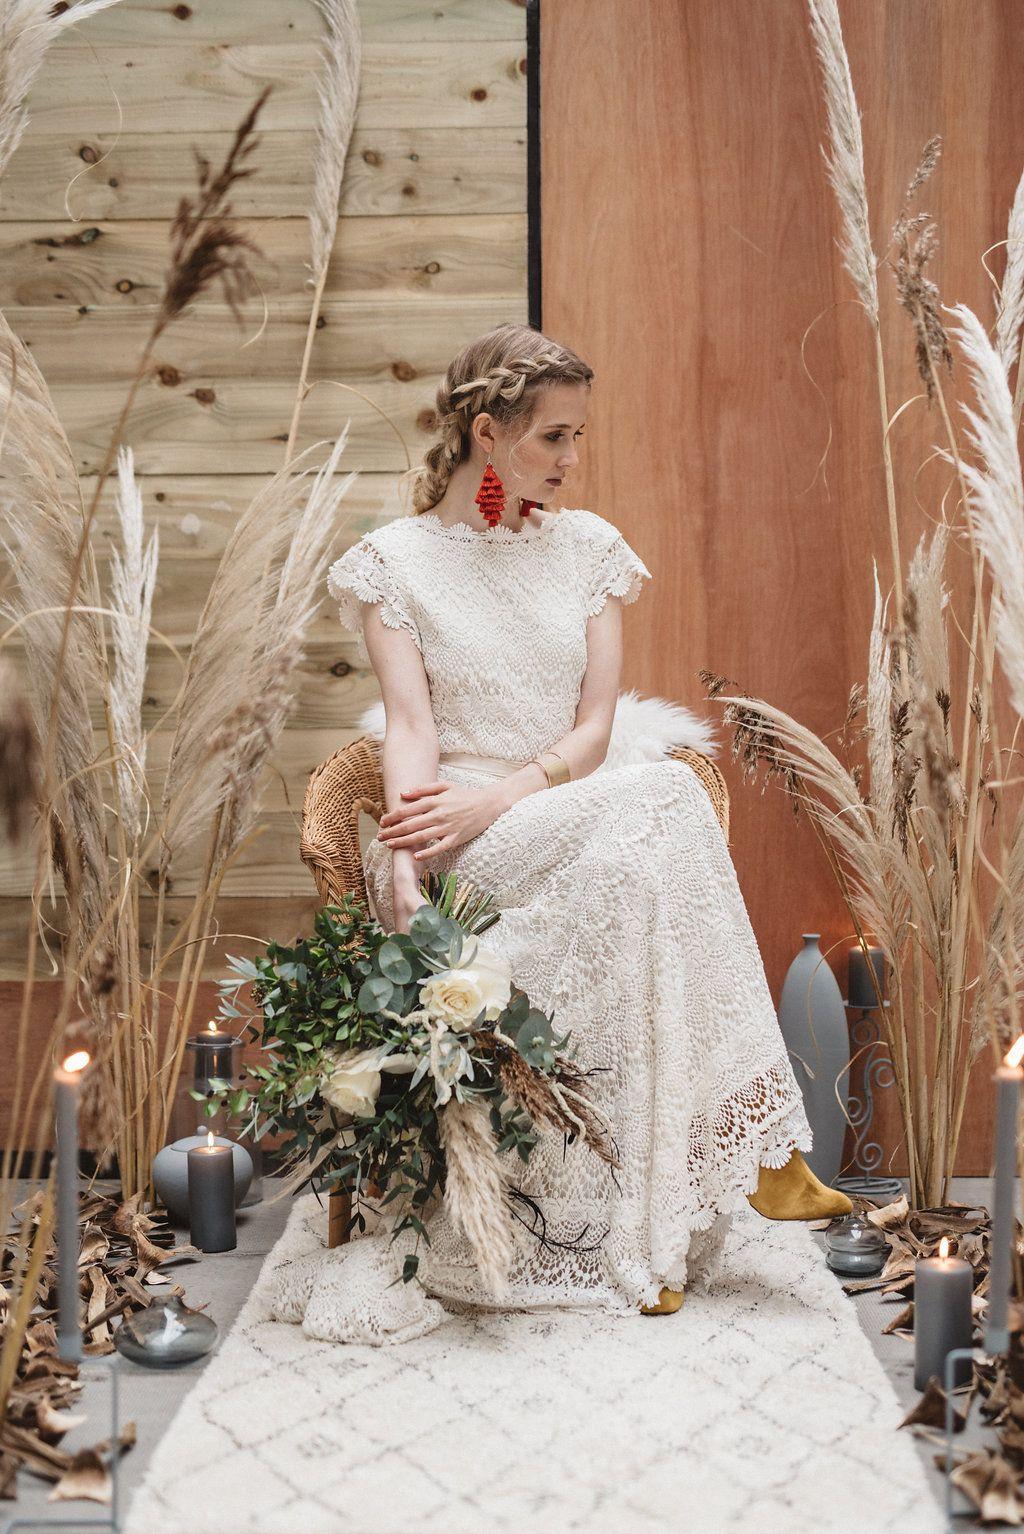 The bohemian bride boho wedding inspiration pinterest wedding